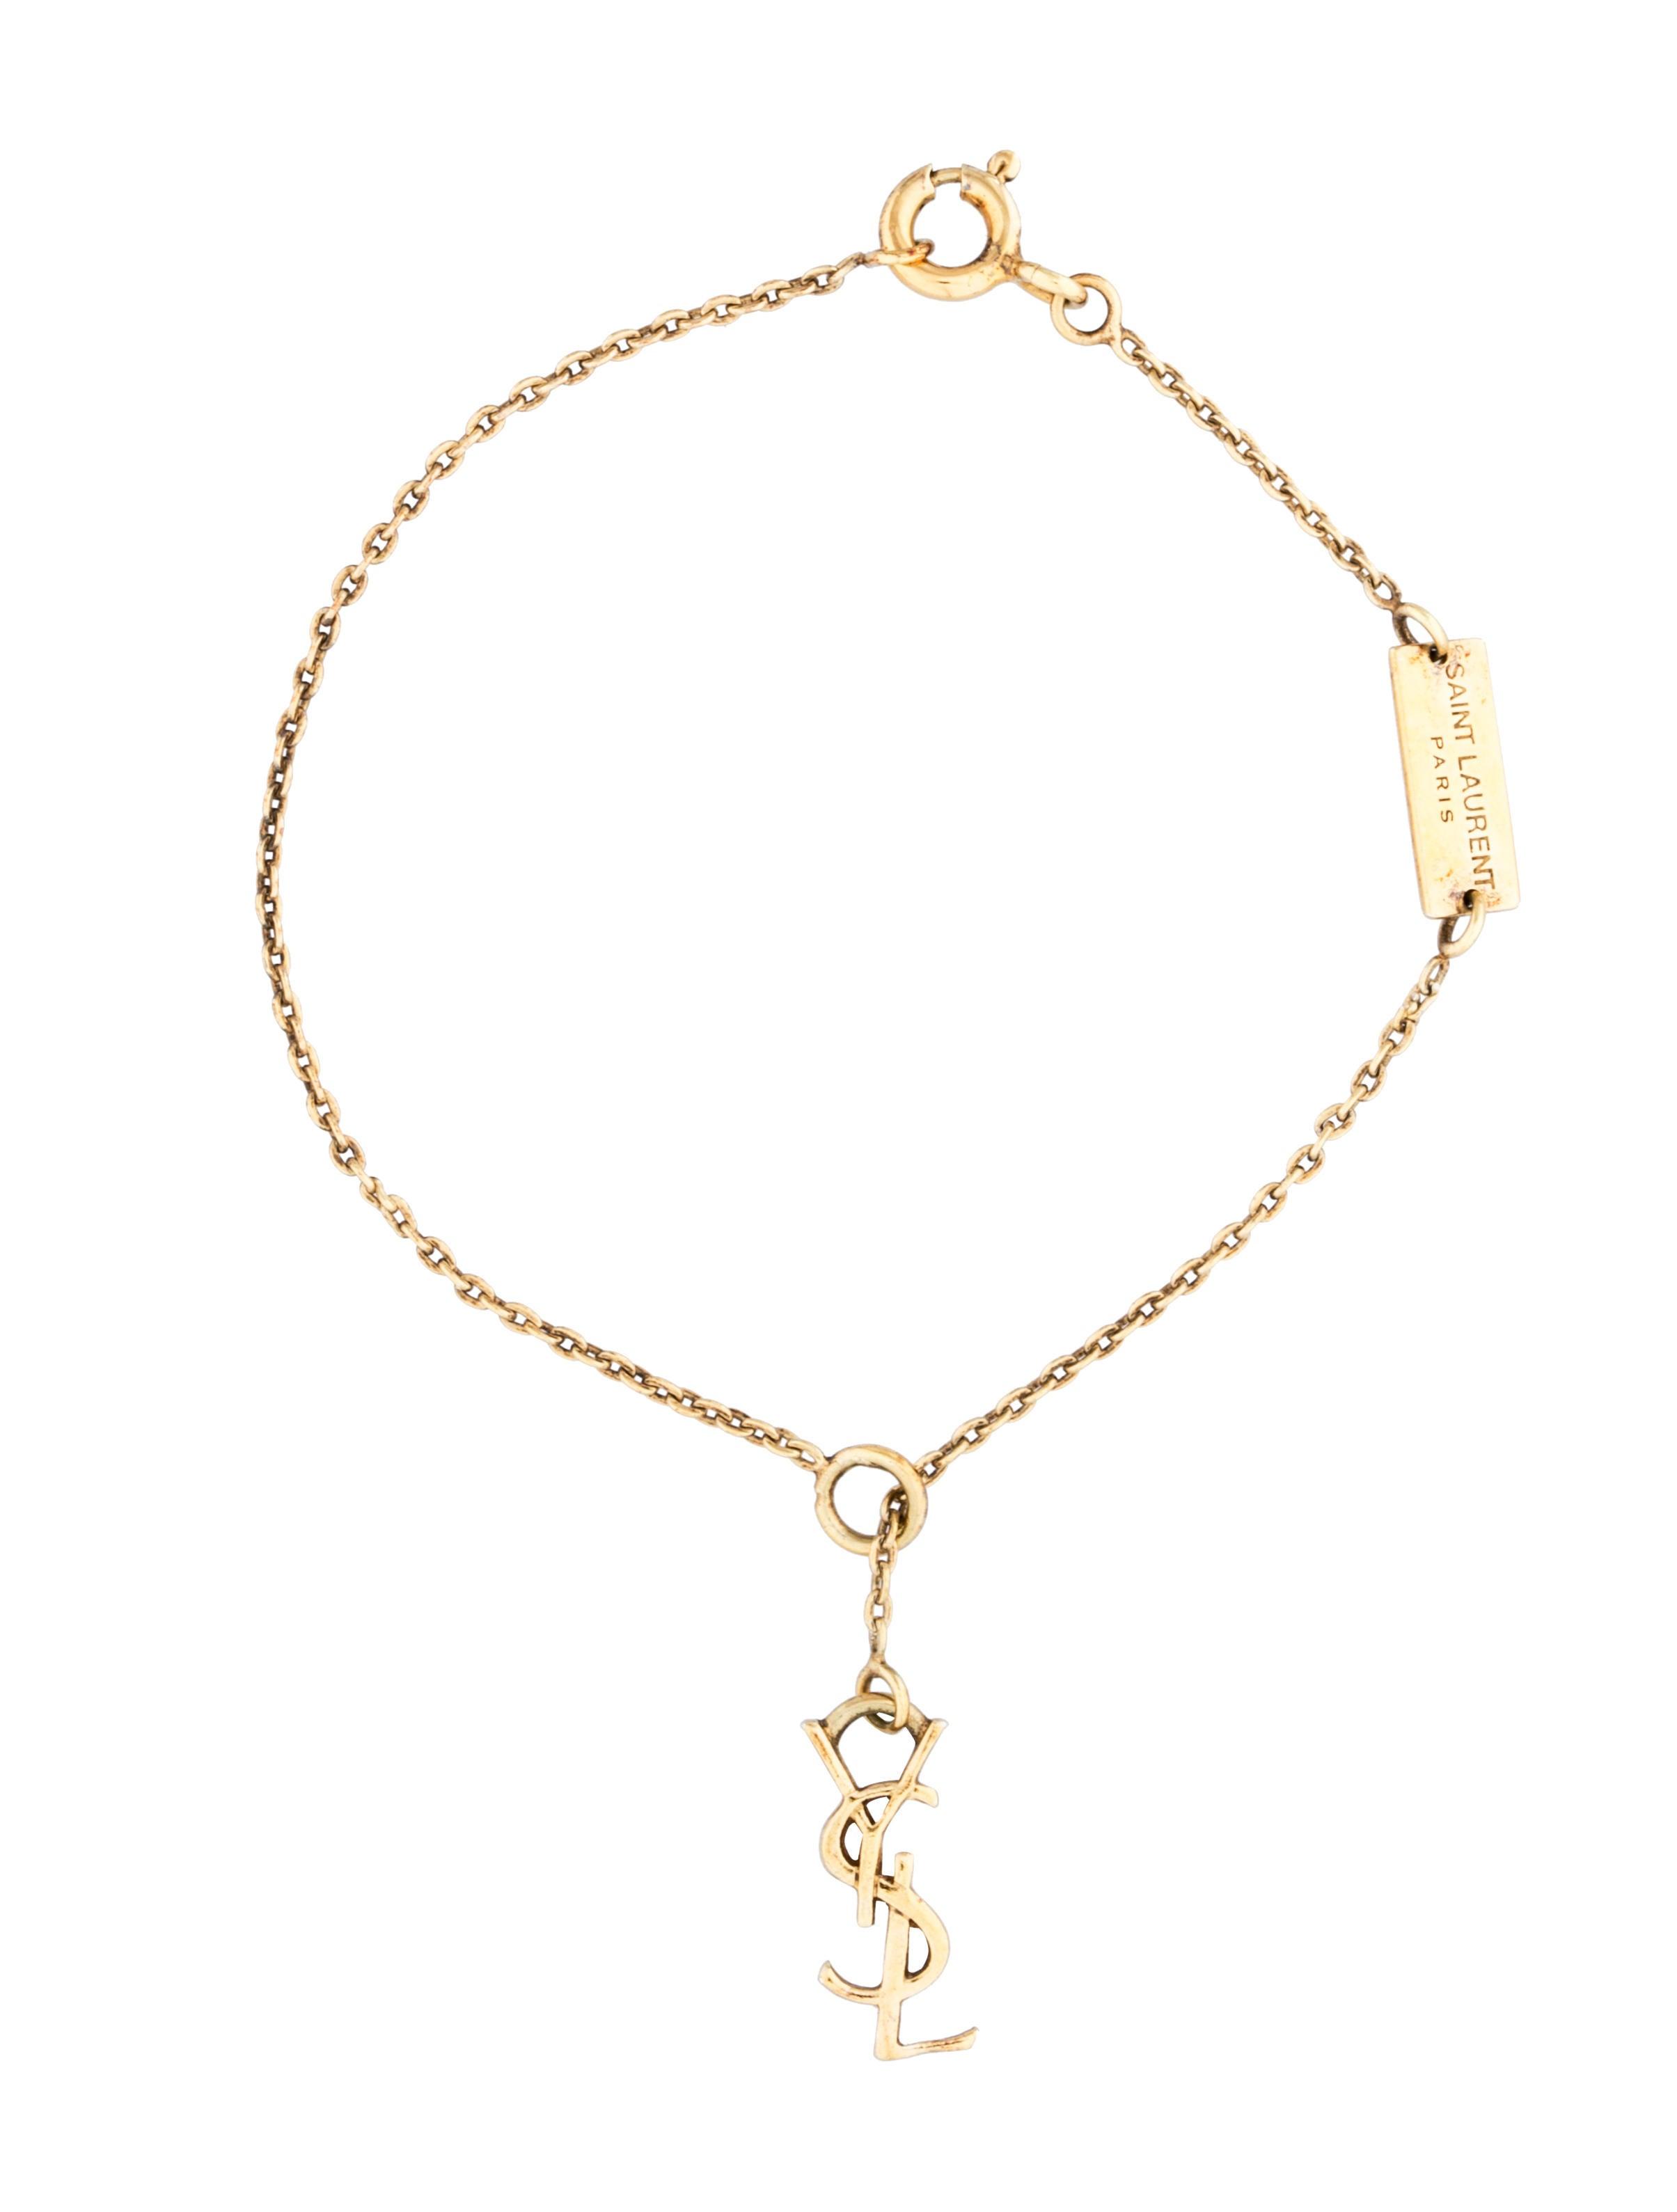 Signature Monogram Charm Bracelet